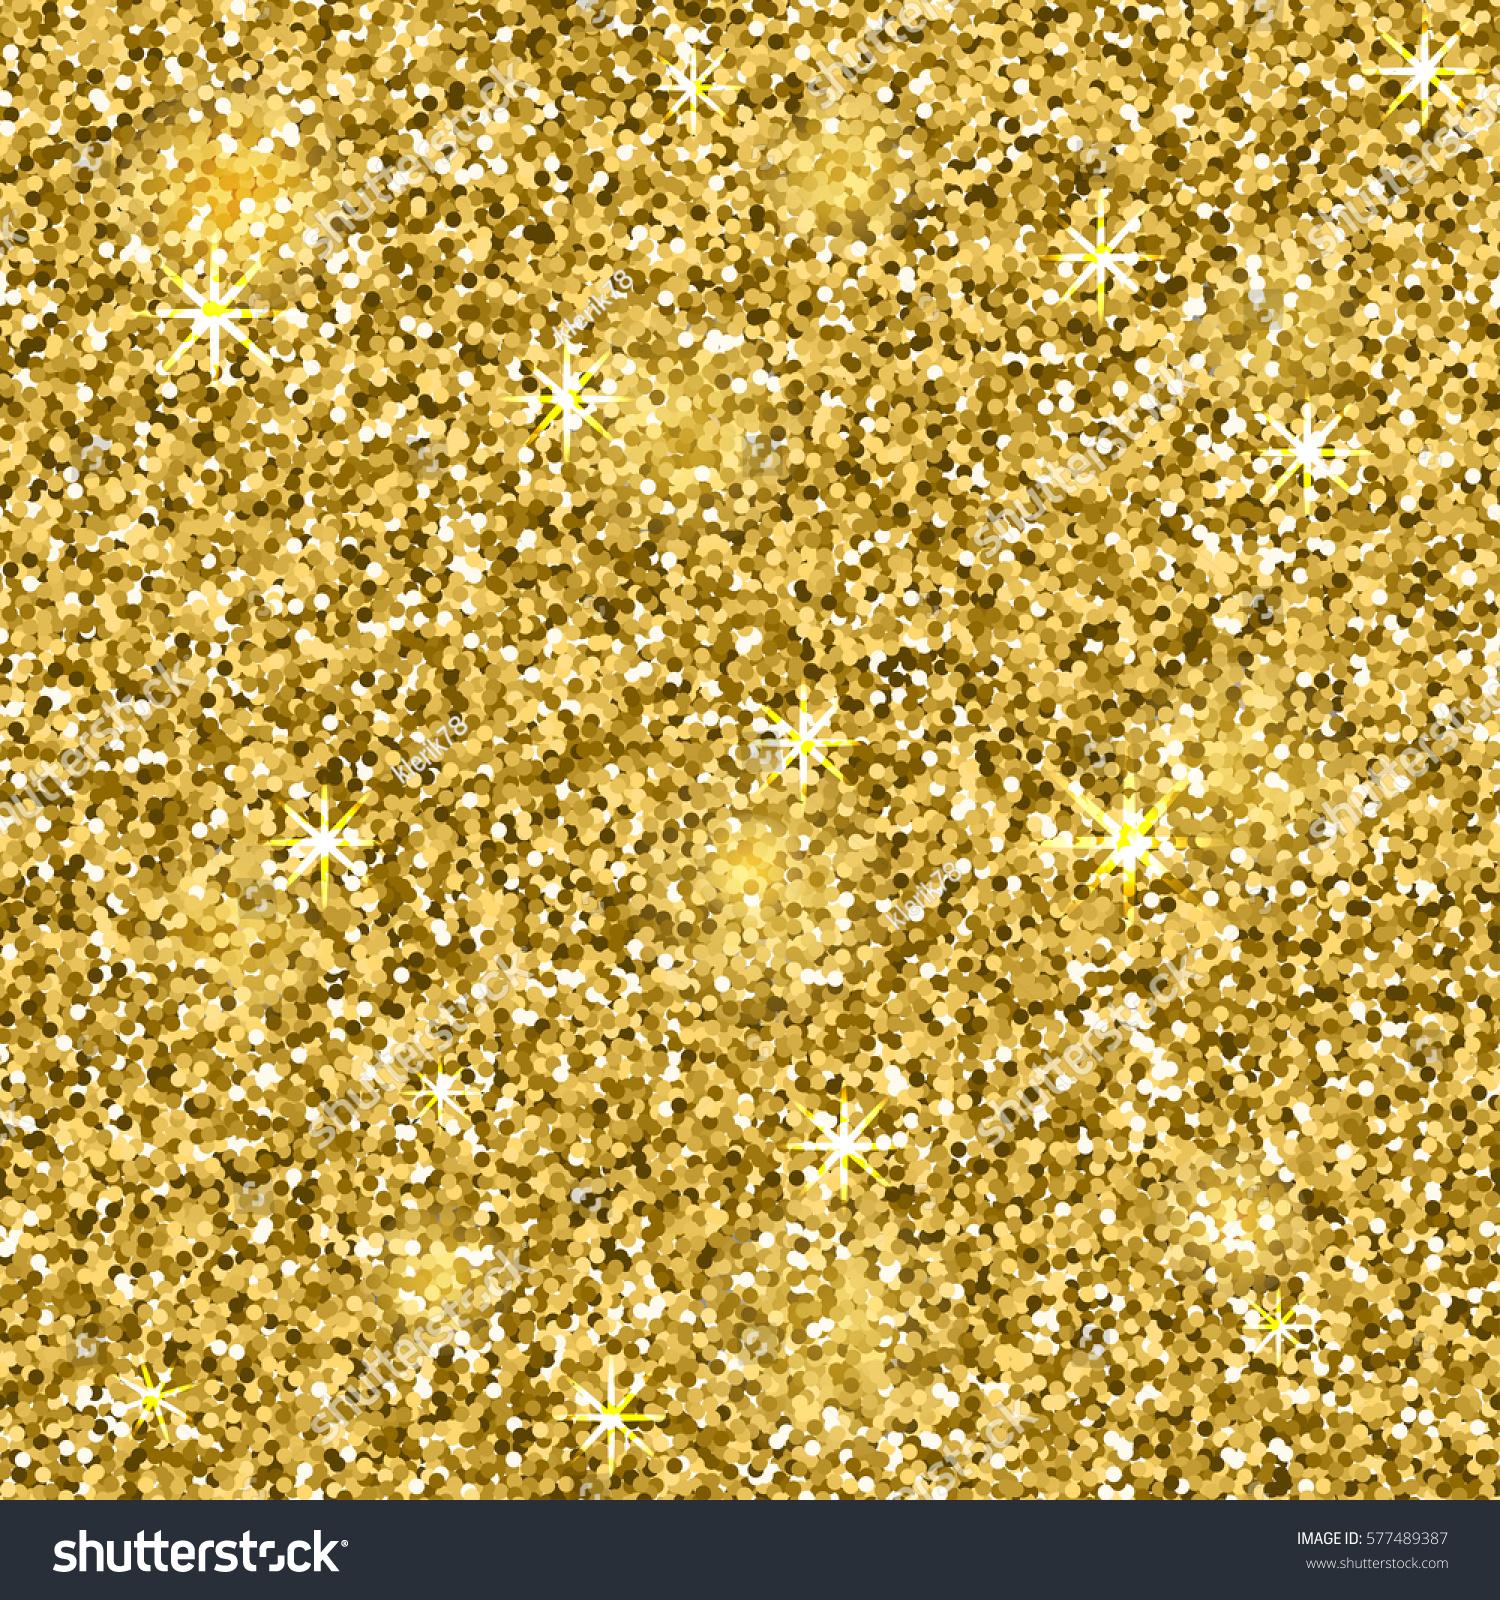 gold glitter background golden sparkles on border template for holiday designs invitation